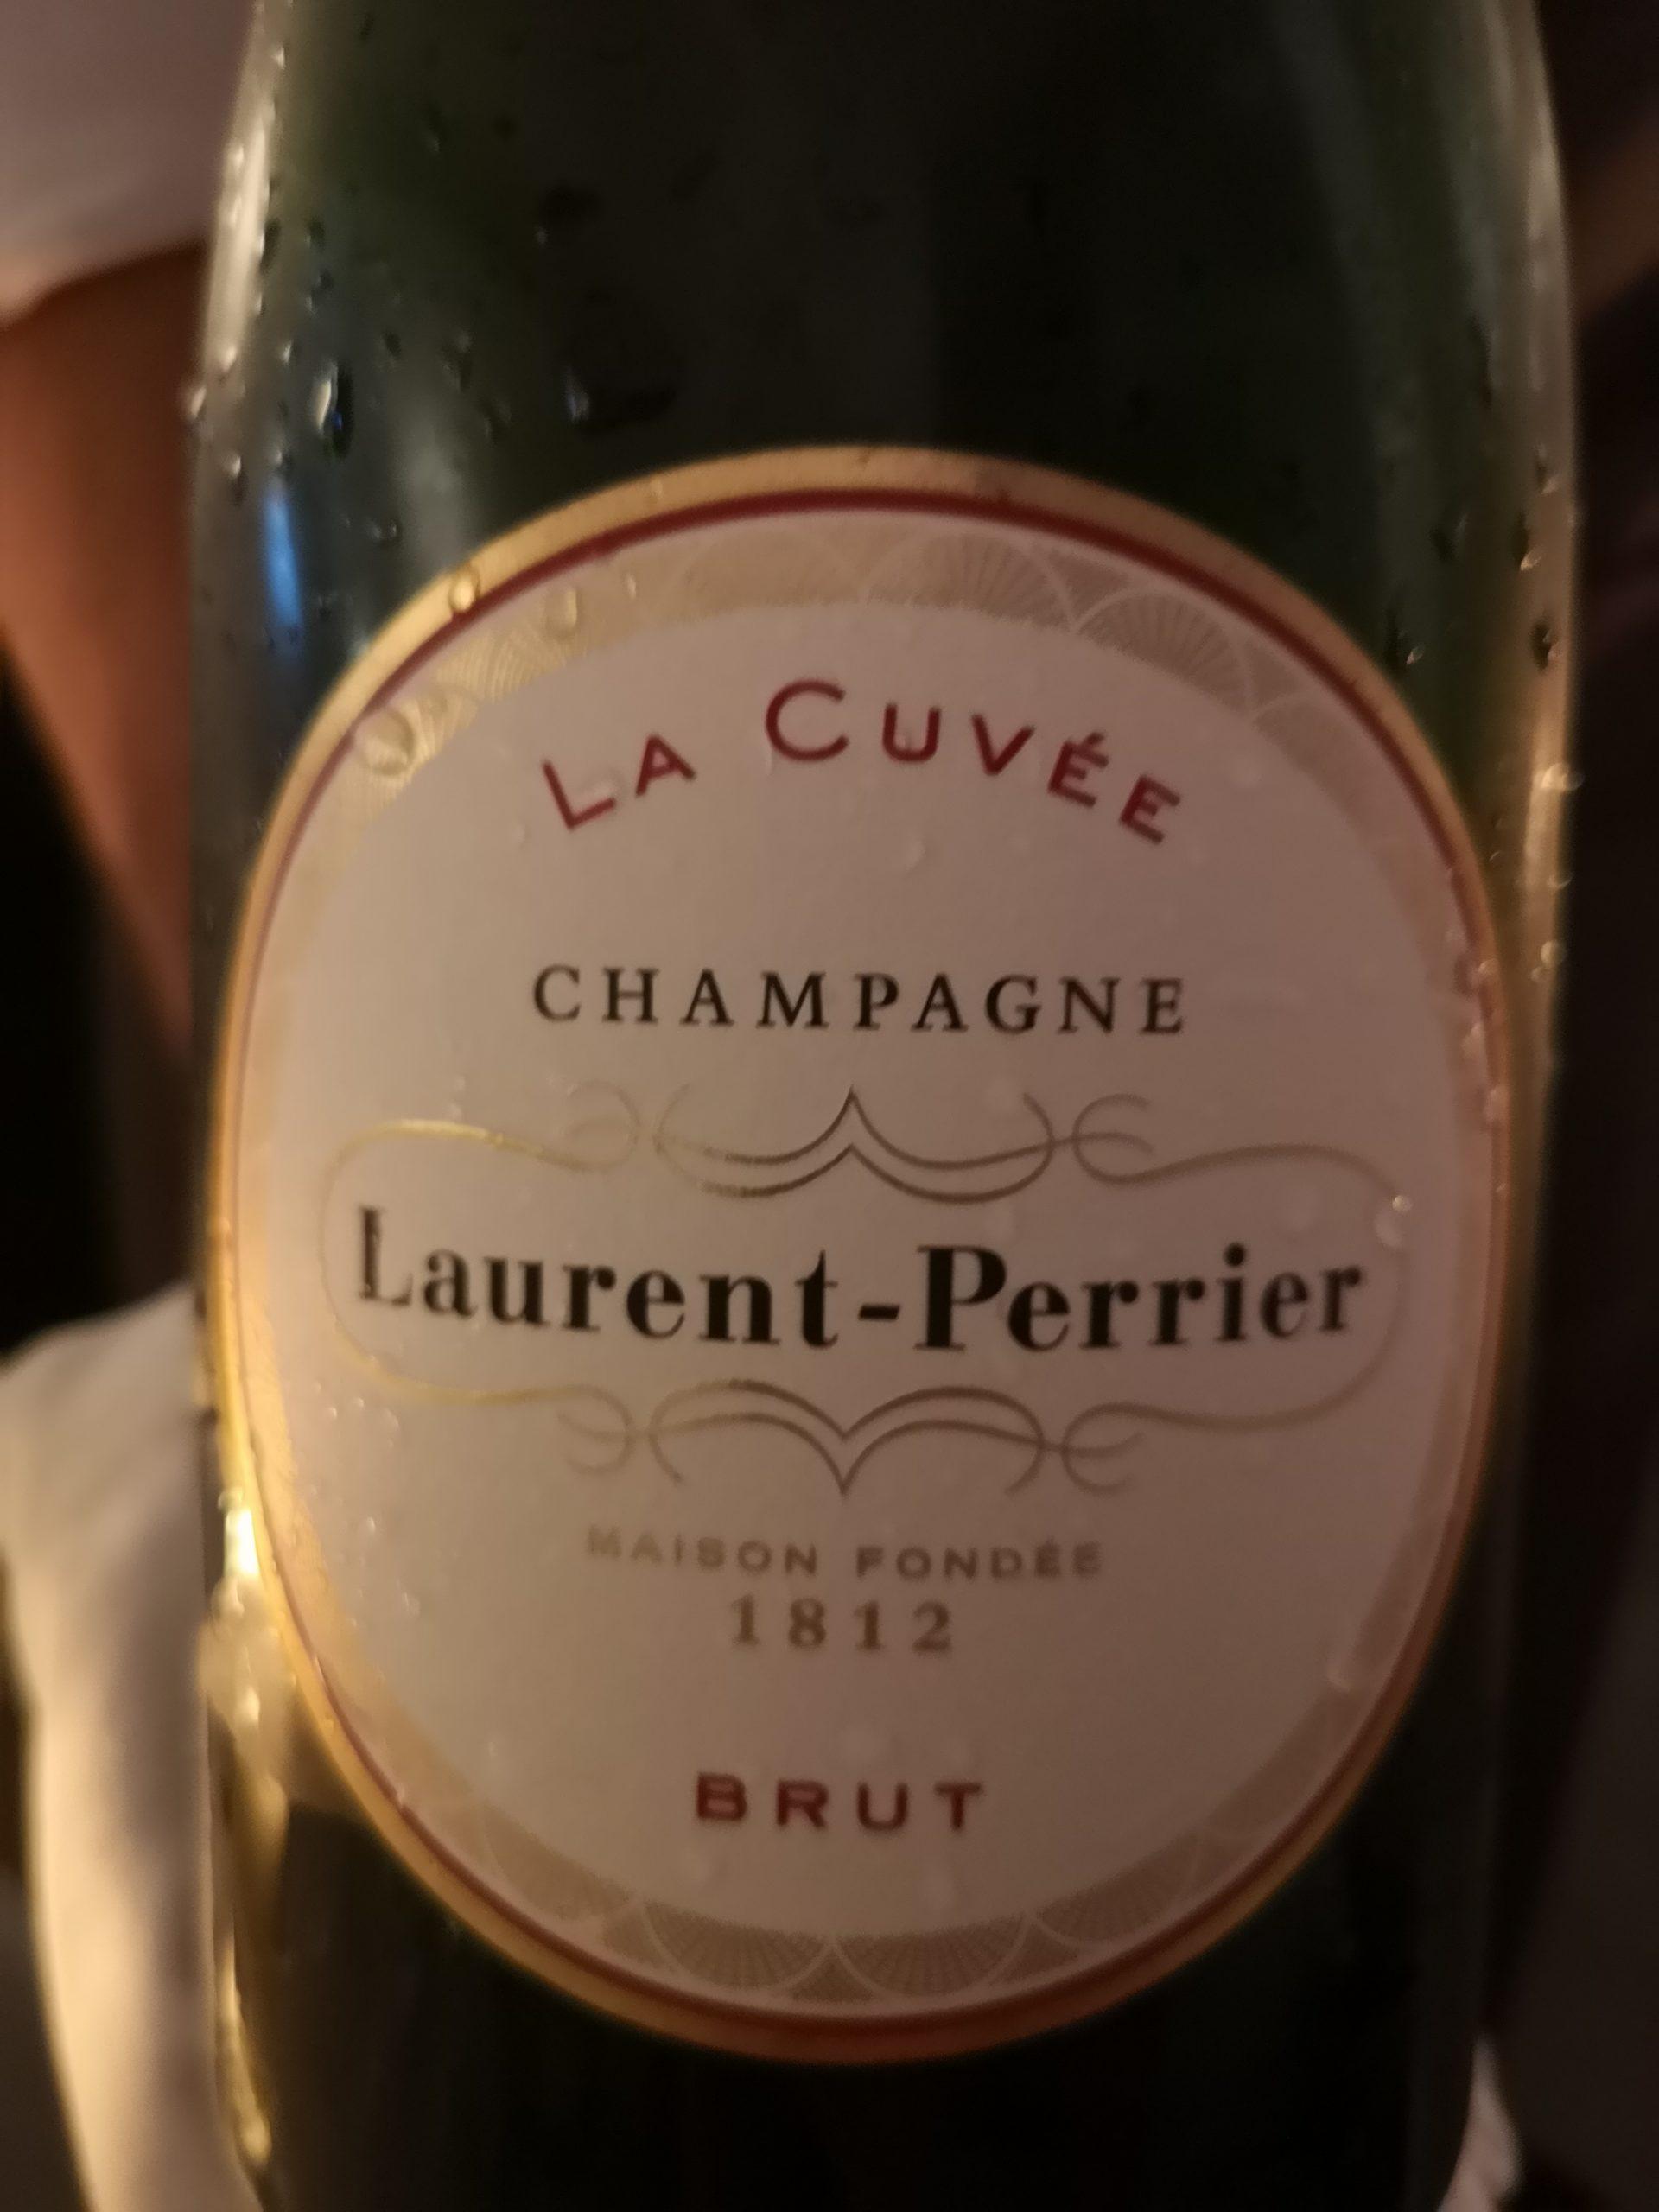 -nv- Champagne La Cuvée Brut | Laurent-Perrier